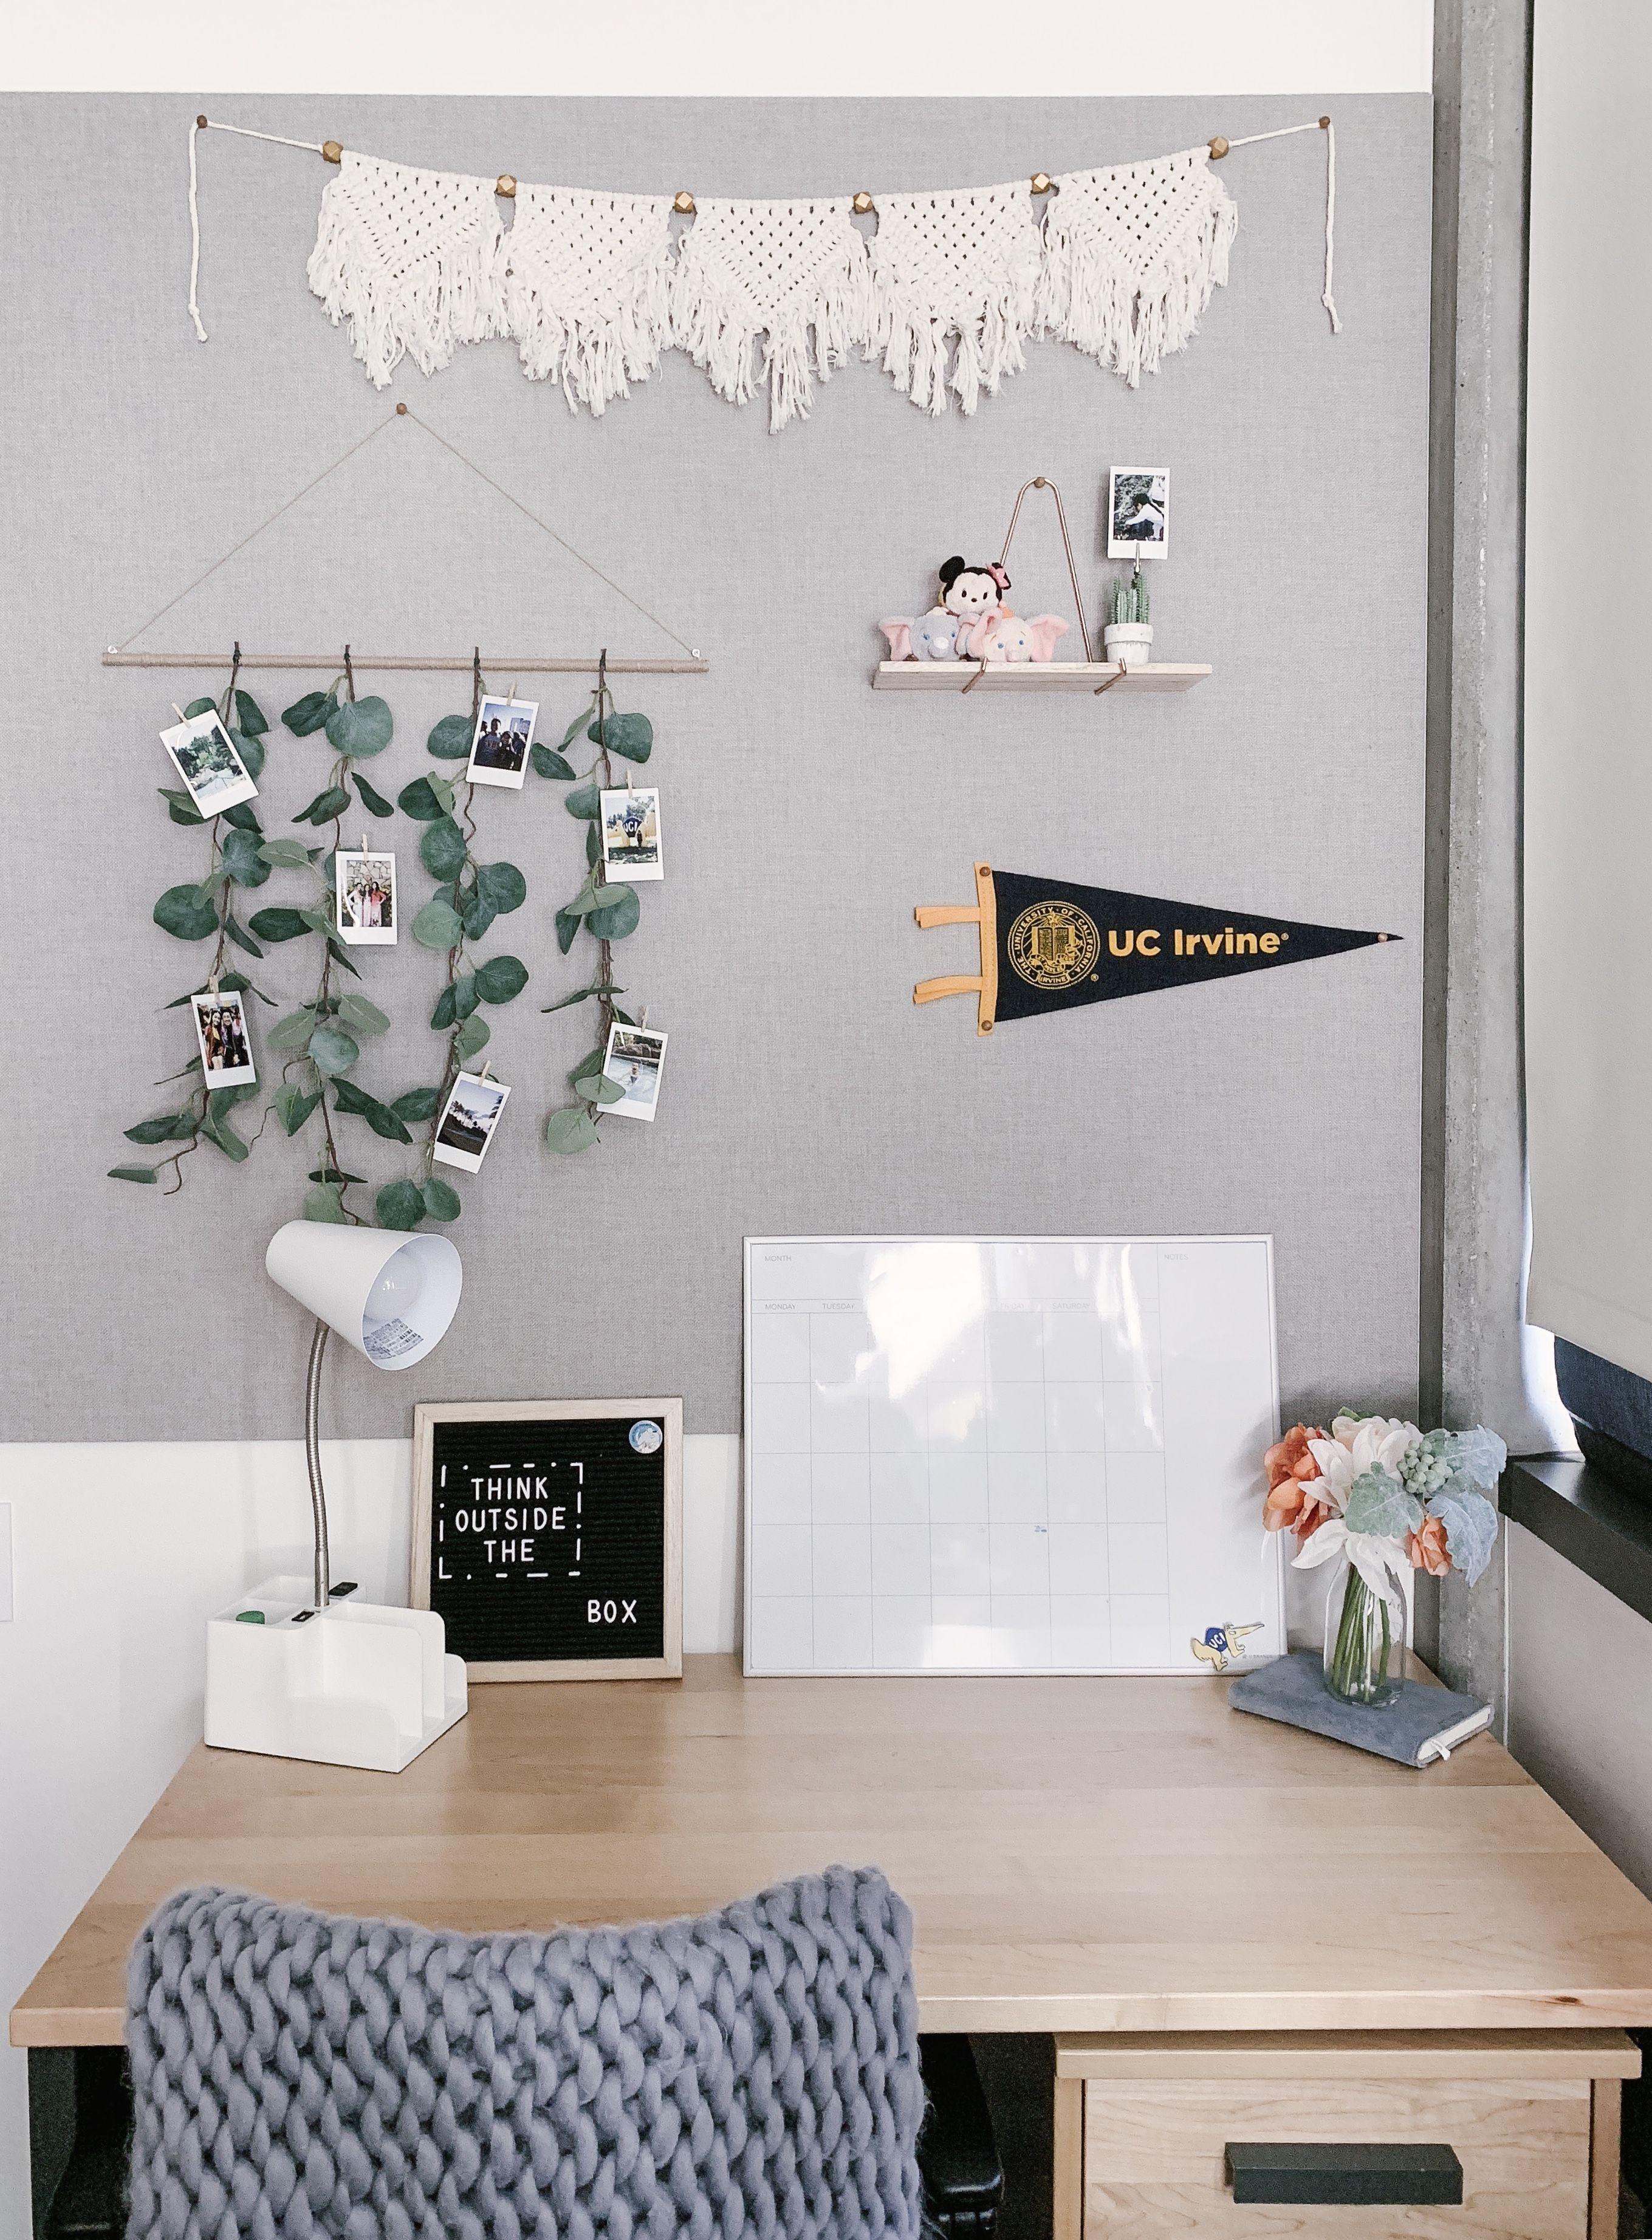 Boho College Dorm Room Desk Decor Simple Minimalistic Boho Dorm Room Dorm Room Inspiration Dorm Room Desk